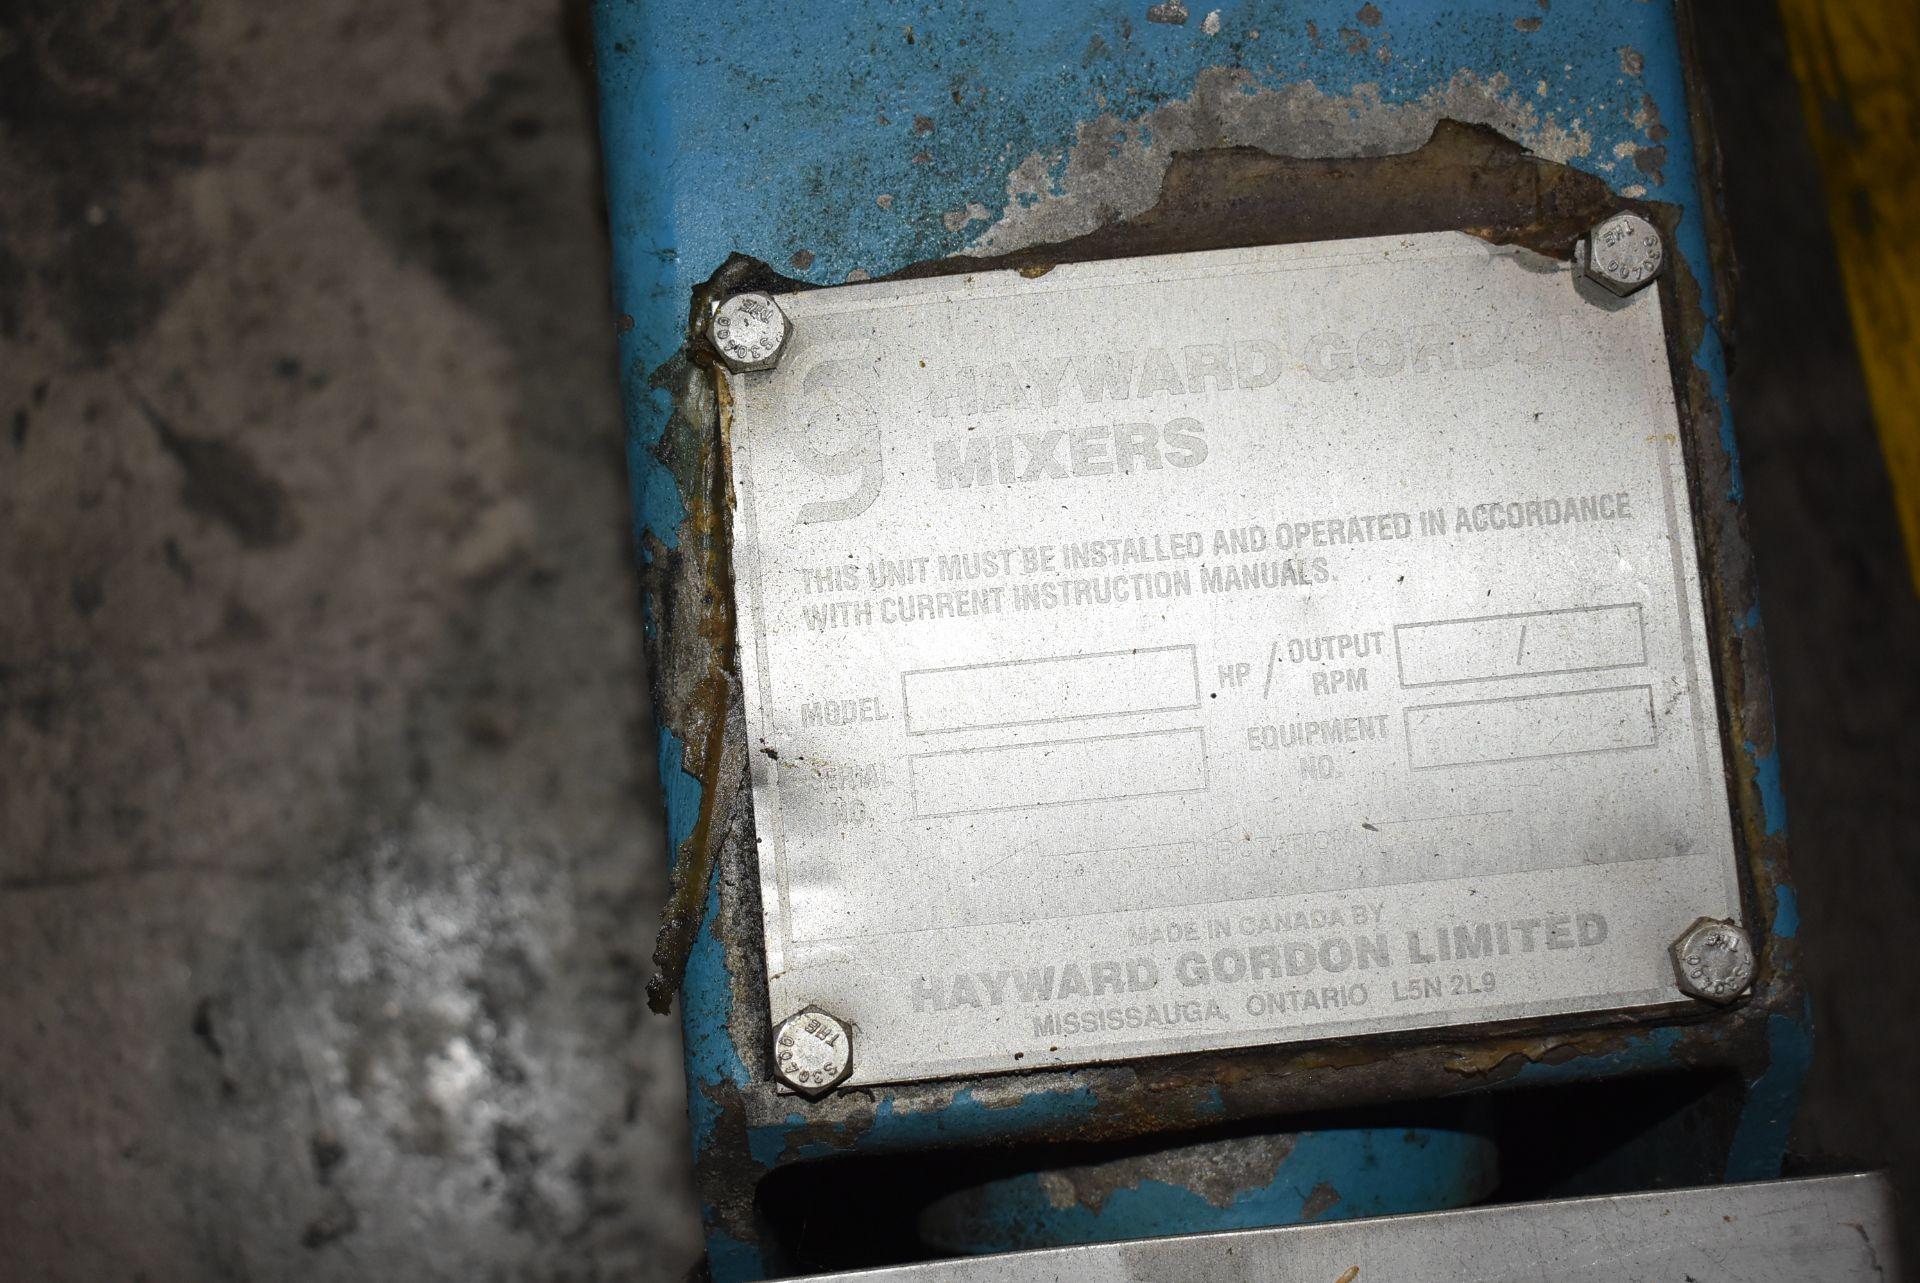 "Hayward Gordon Mixer, 60"" Length - Image 2 of 3"